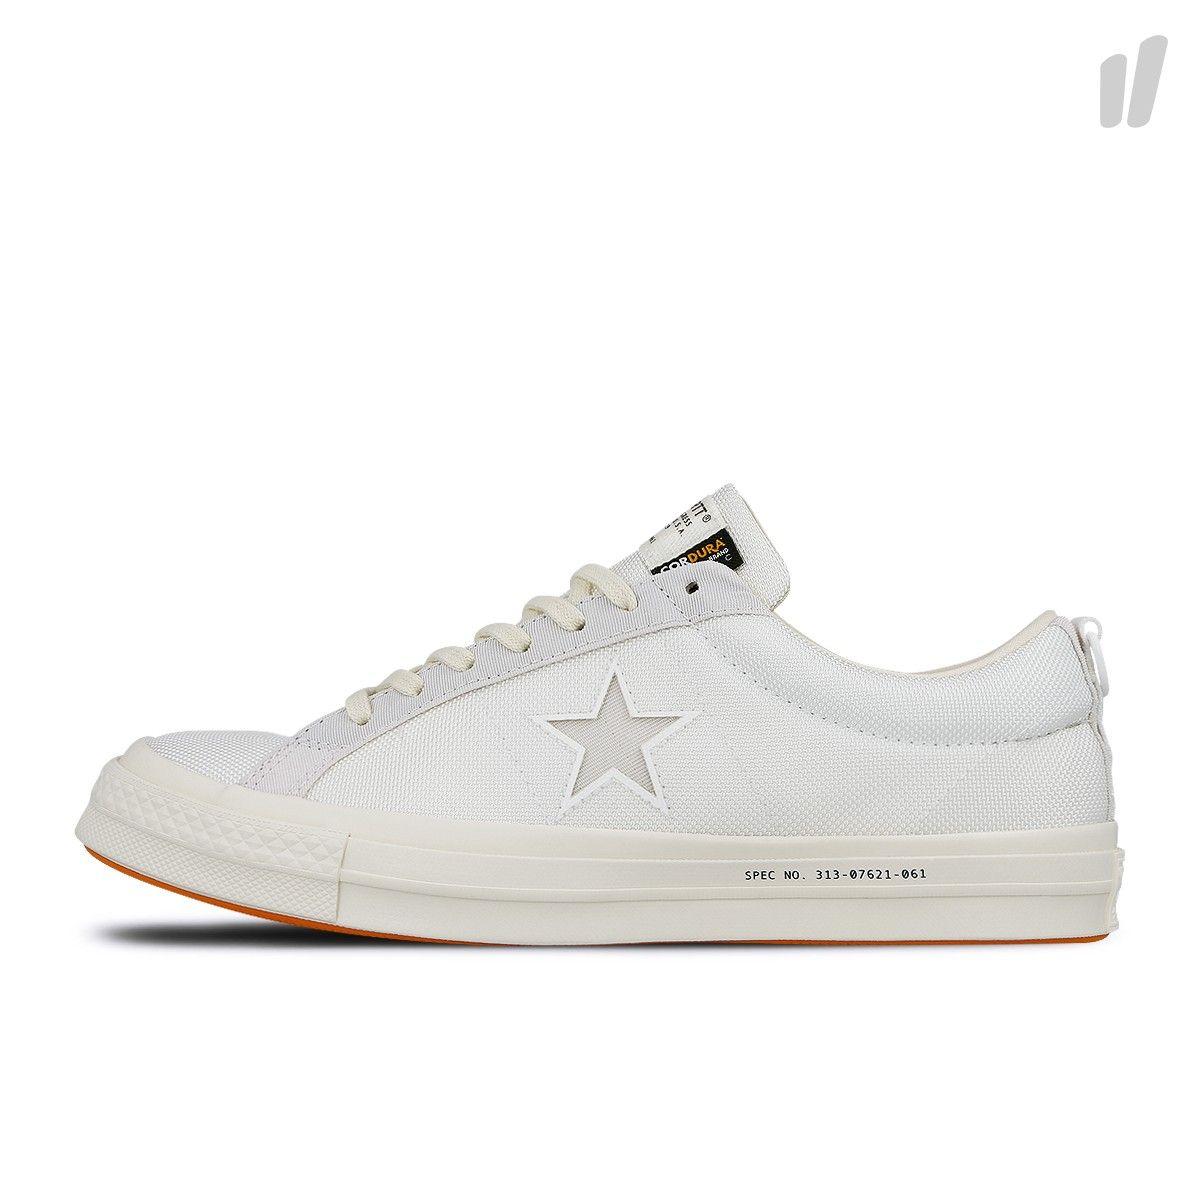 Carhartt WIP x Converse One Star OX ( 162821C White